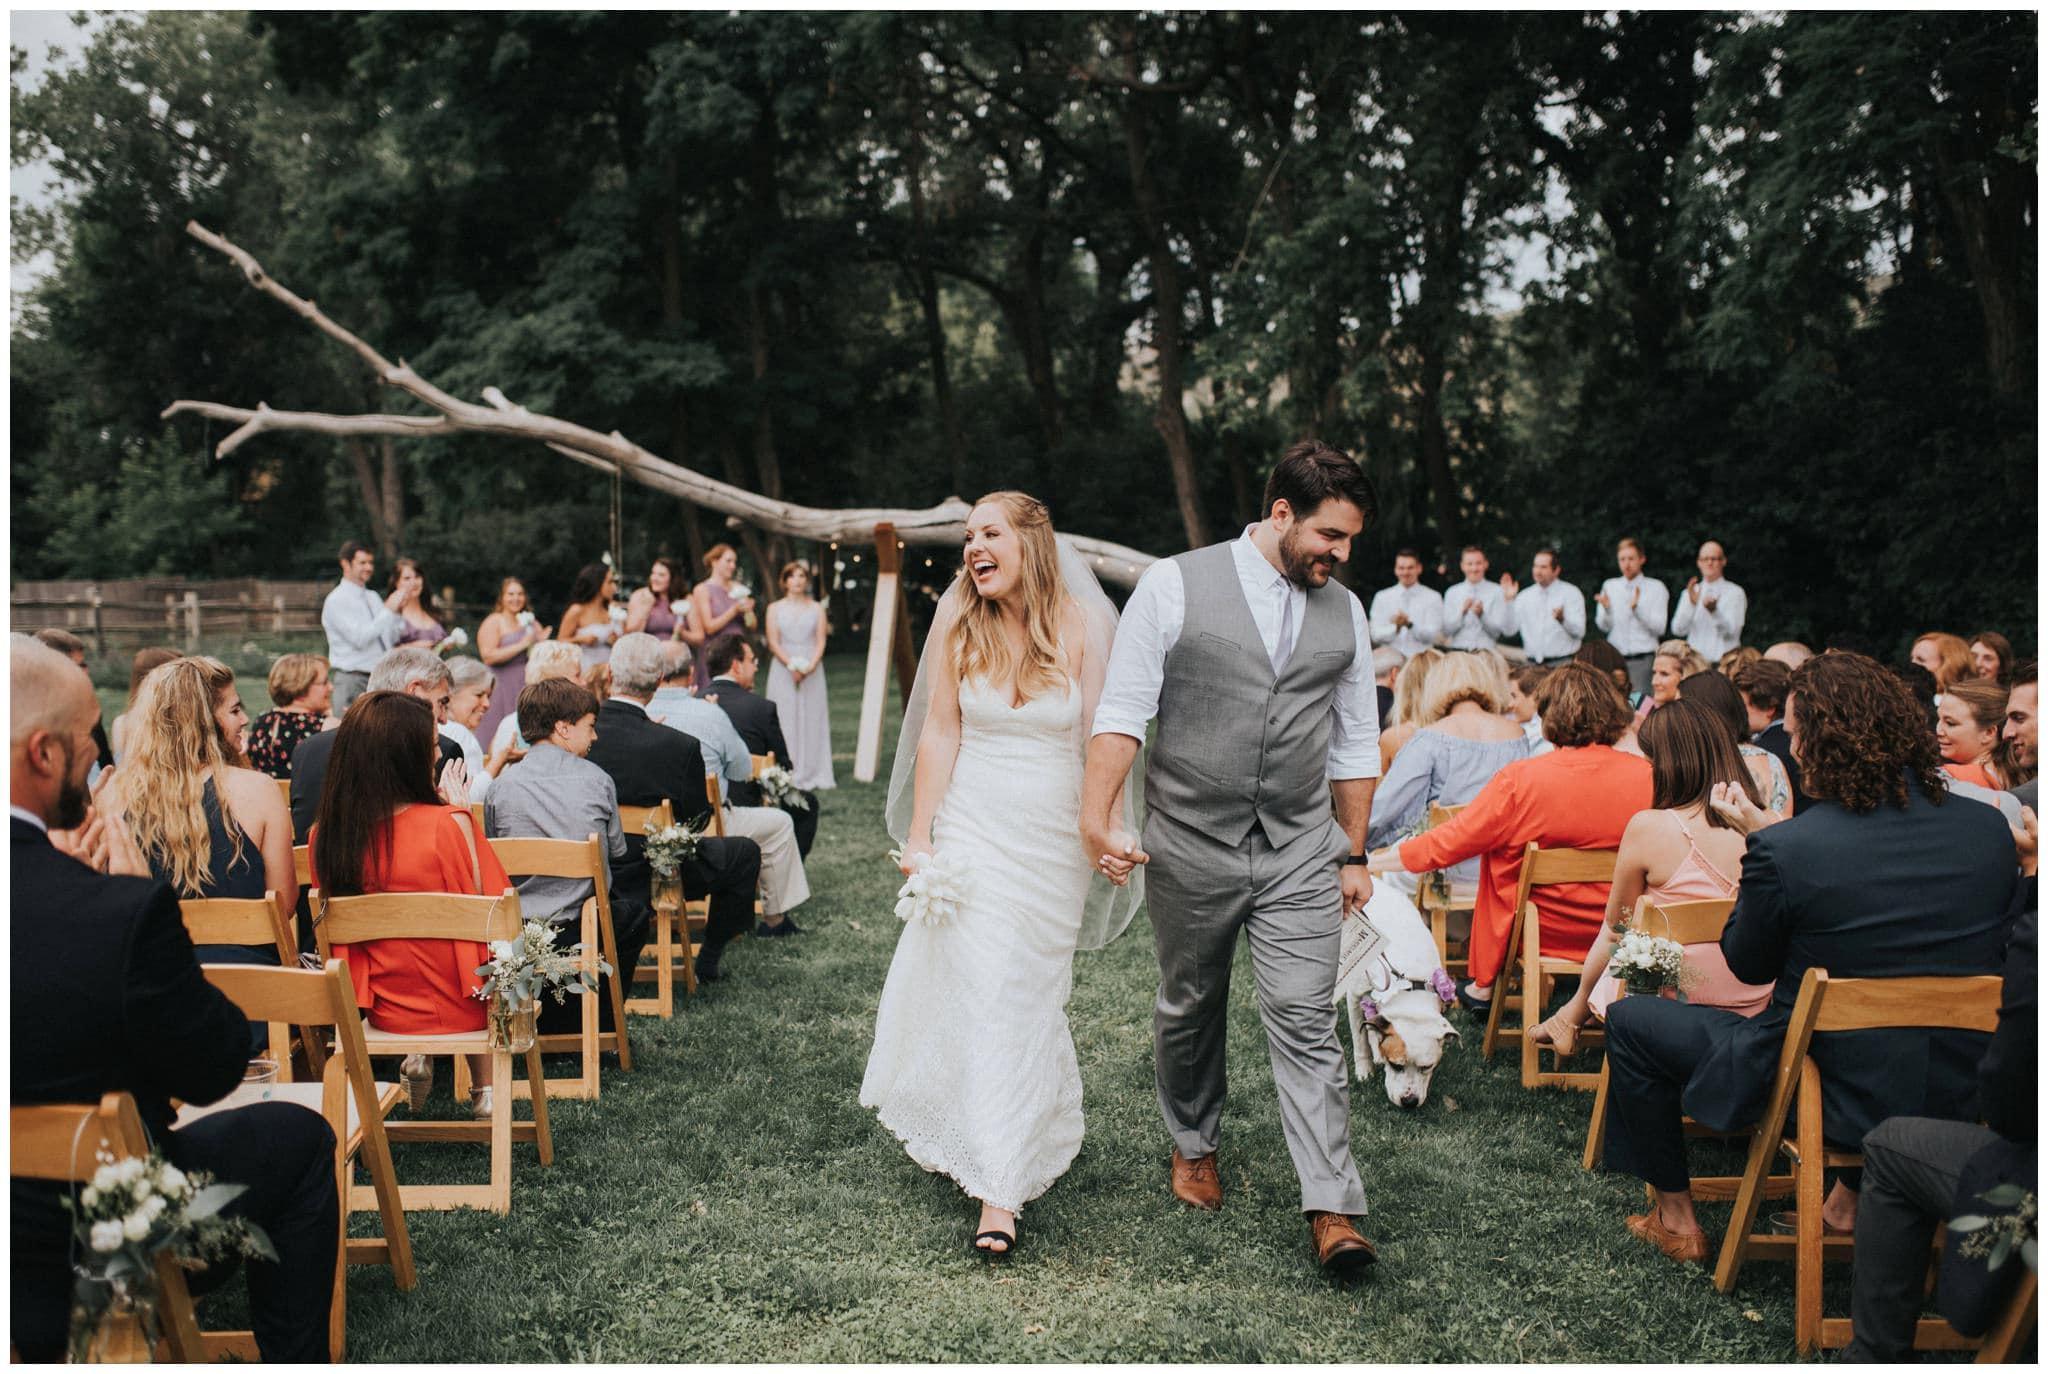 lyons farmette, the lyons farmette, farm wedding, colorado farm wedding, colorado wedding photographer, colorado wedding, denver wedding, denver wedding photographer, llamas, wedding llamas, llama wedding